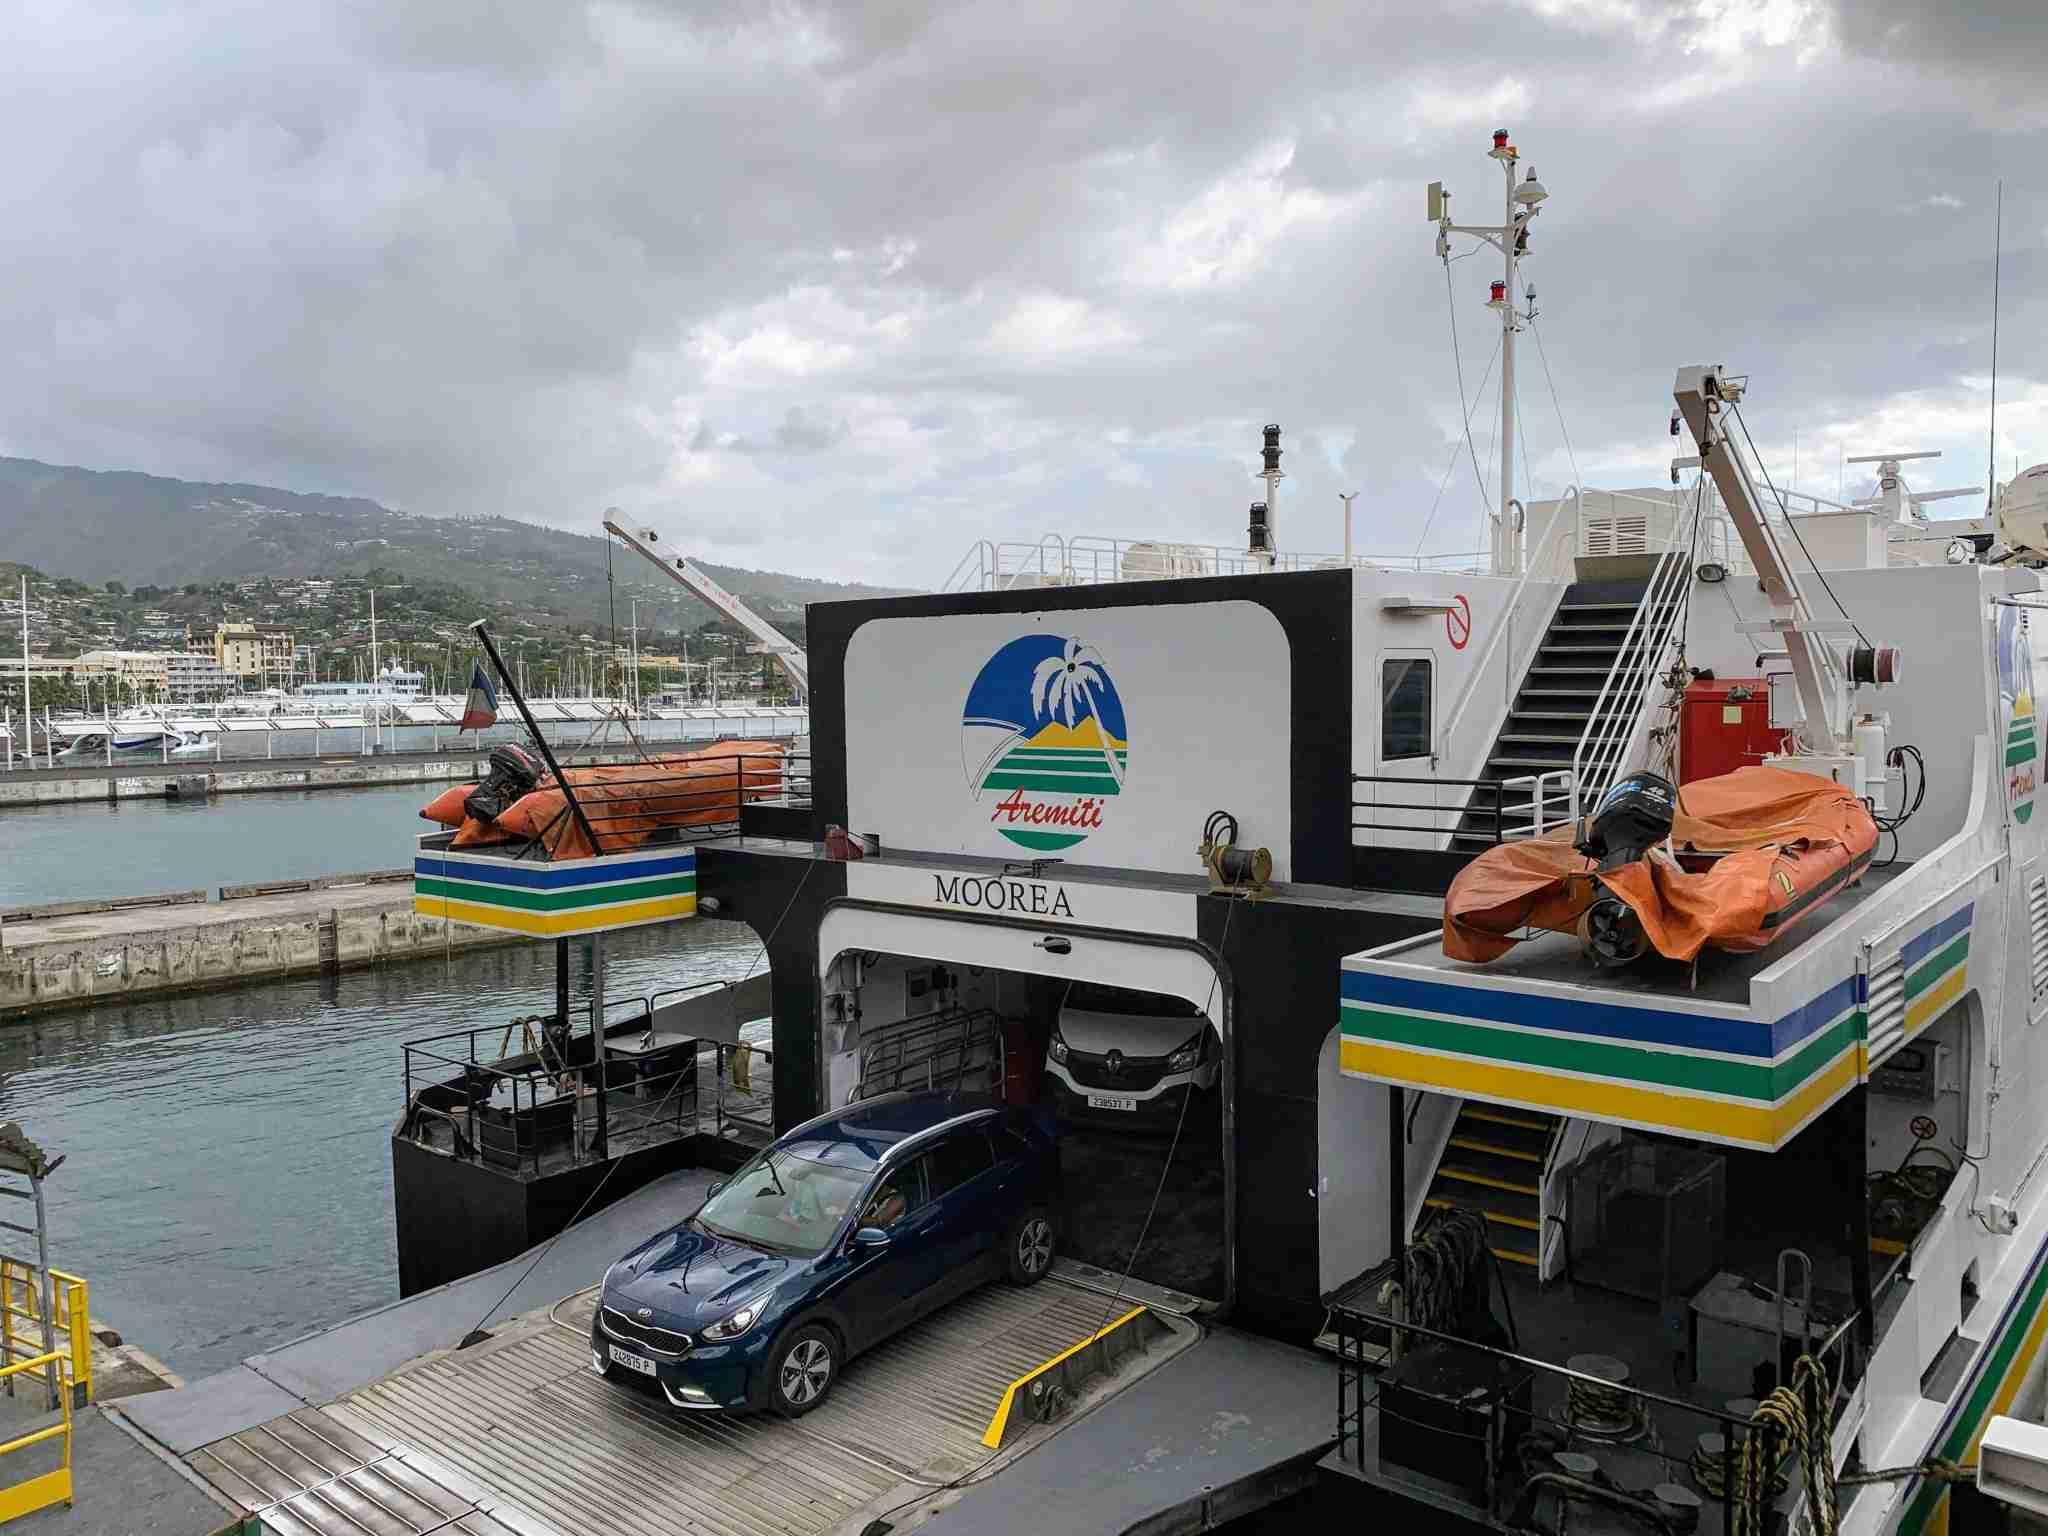 Aremiti Moorea ferry